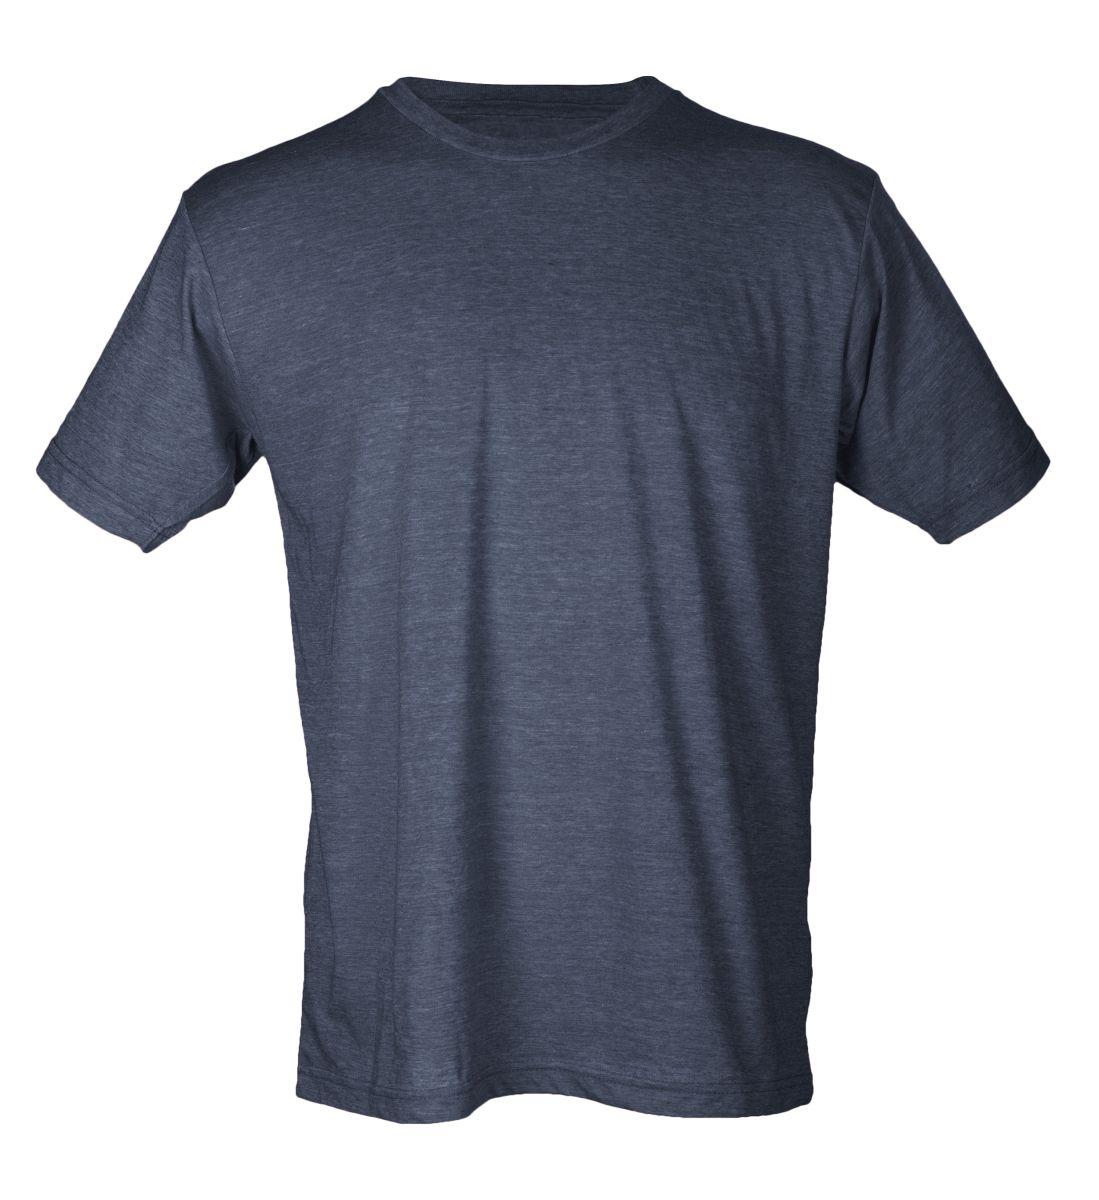 Womens Crew Neck T Shirt